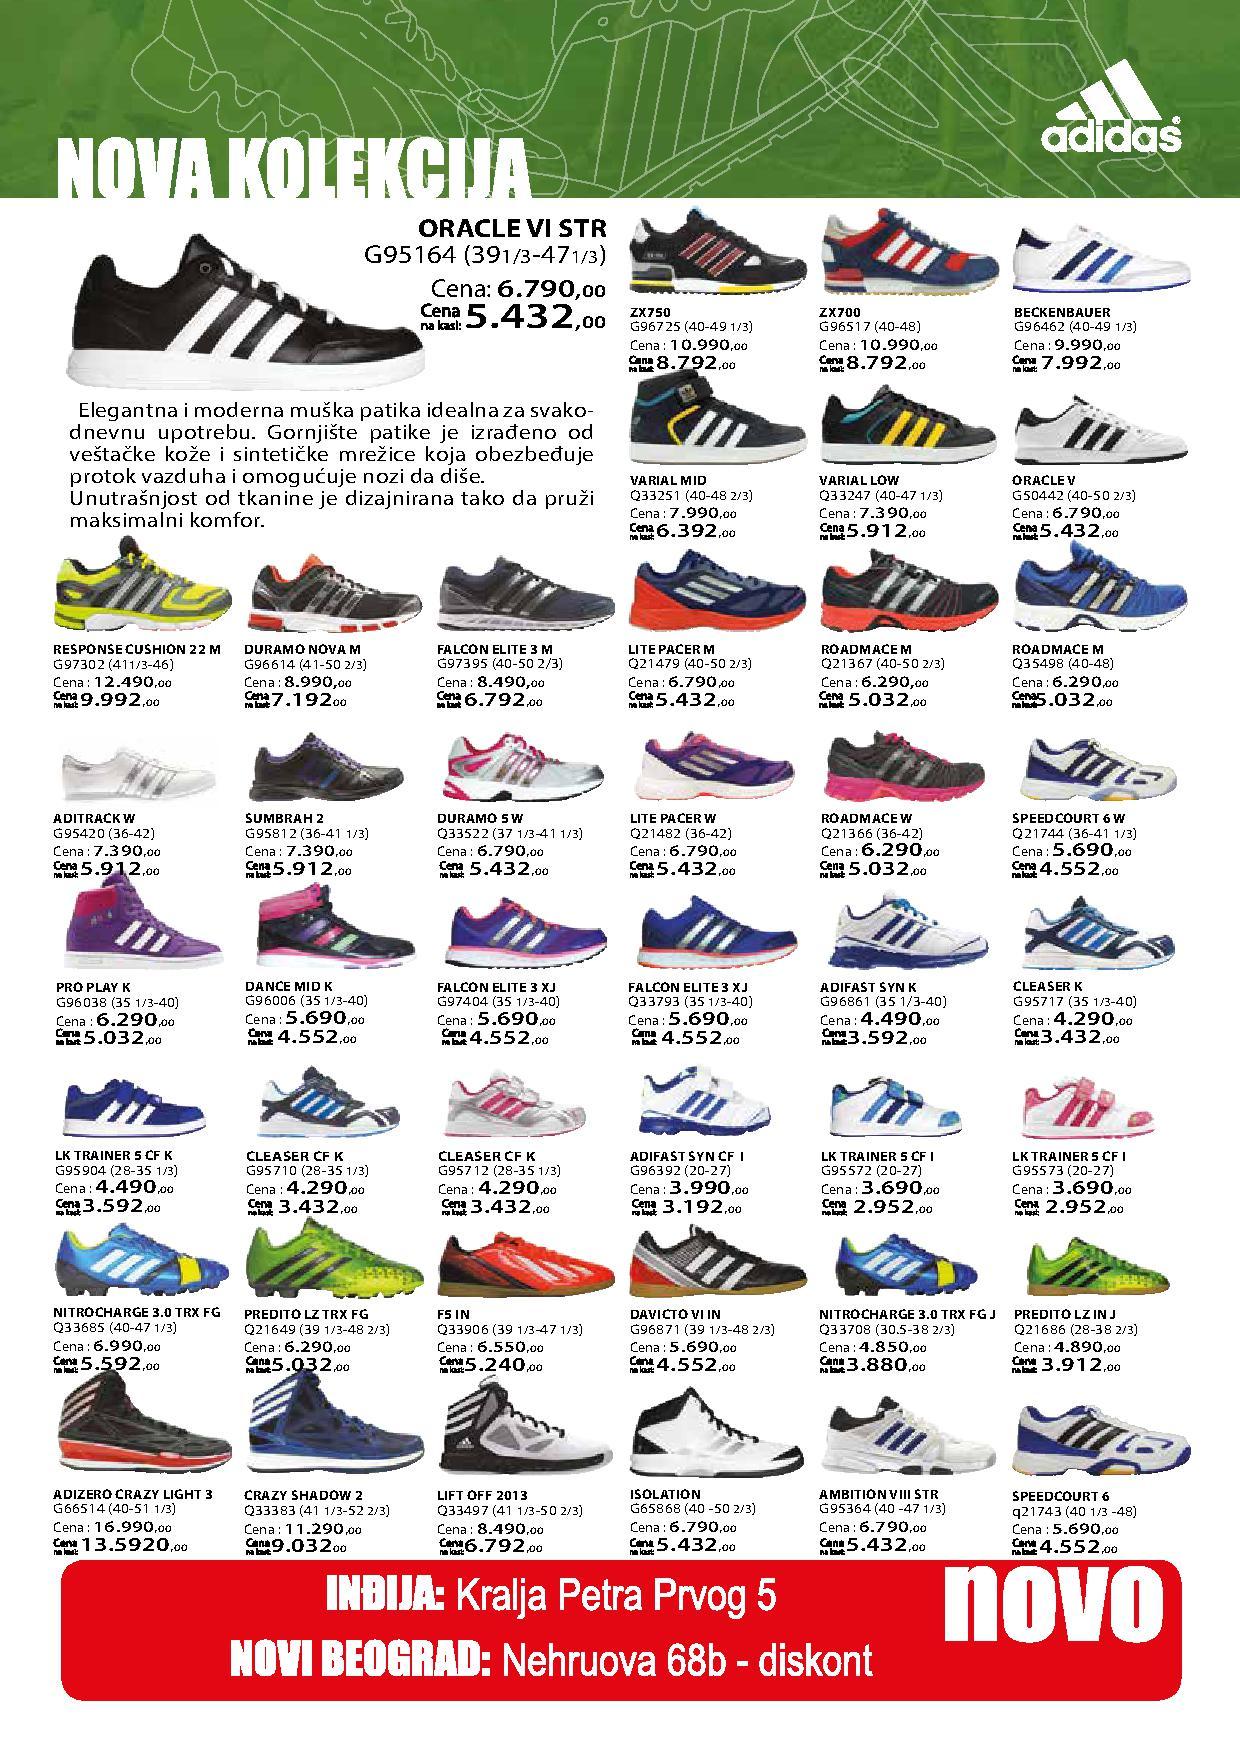 Đak sport katalog super ponude